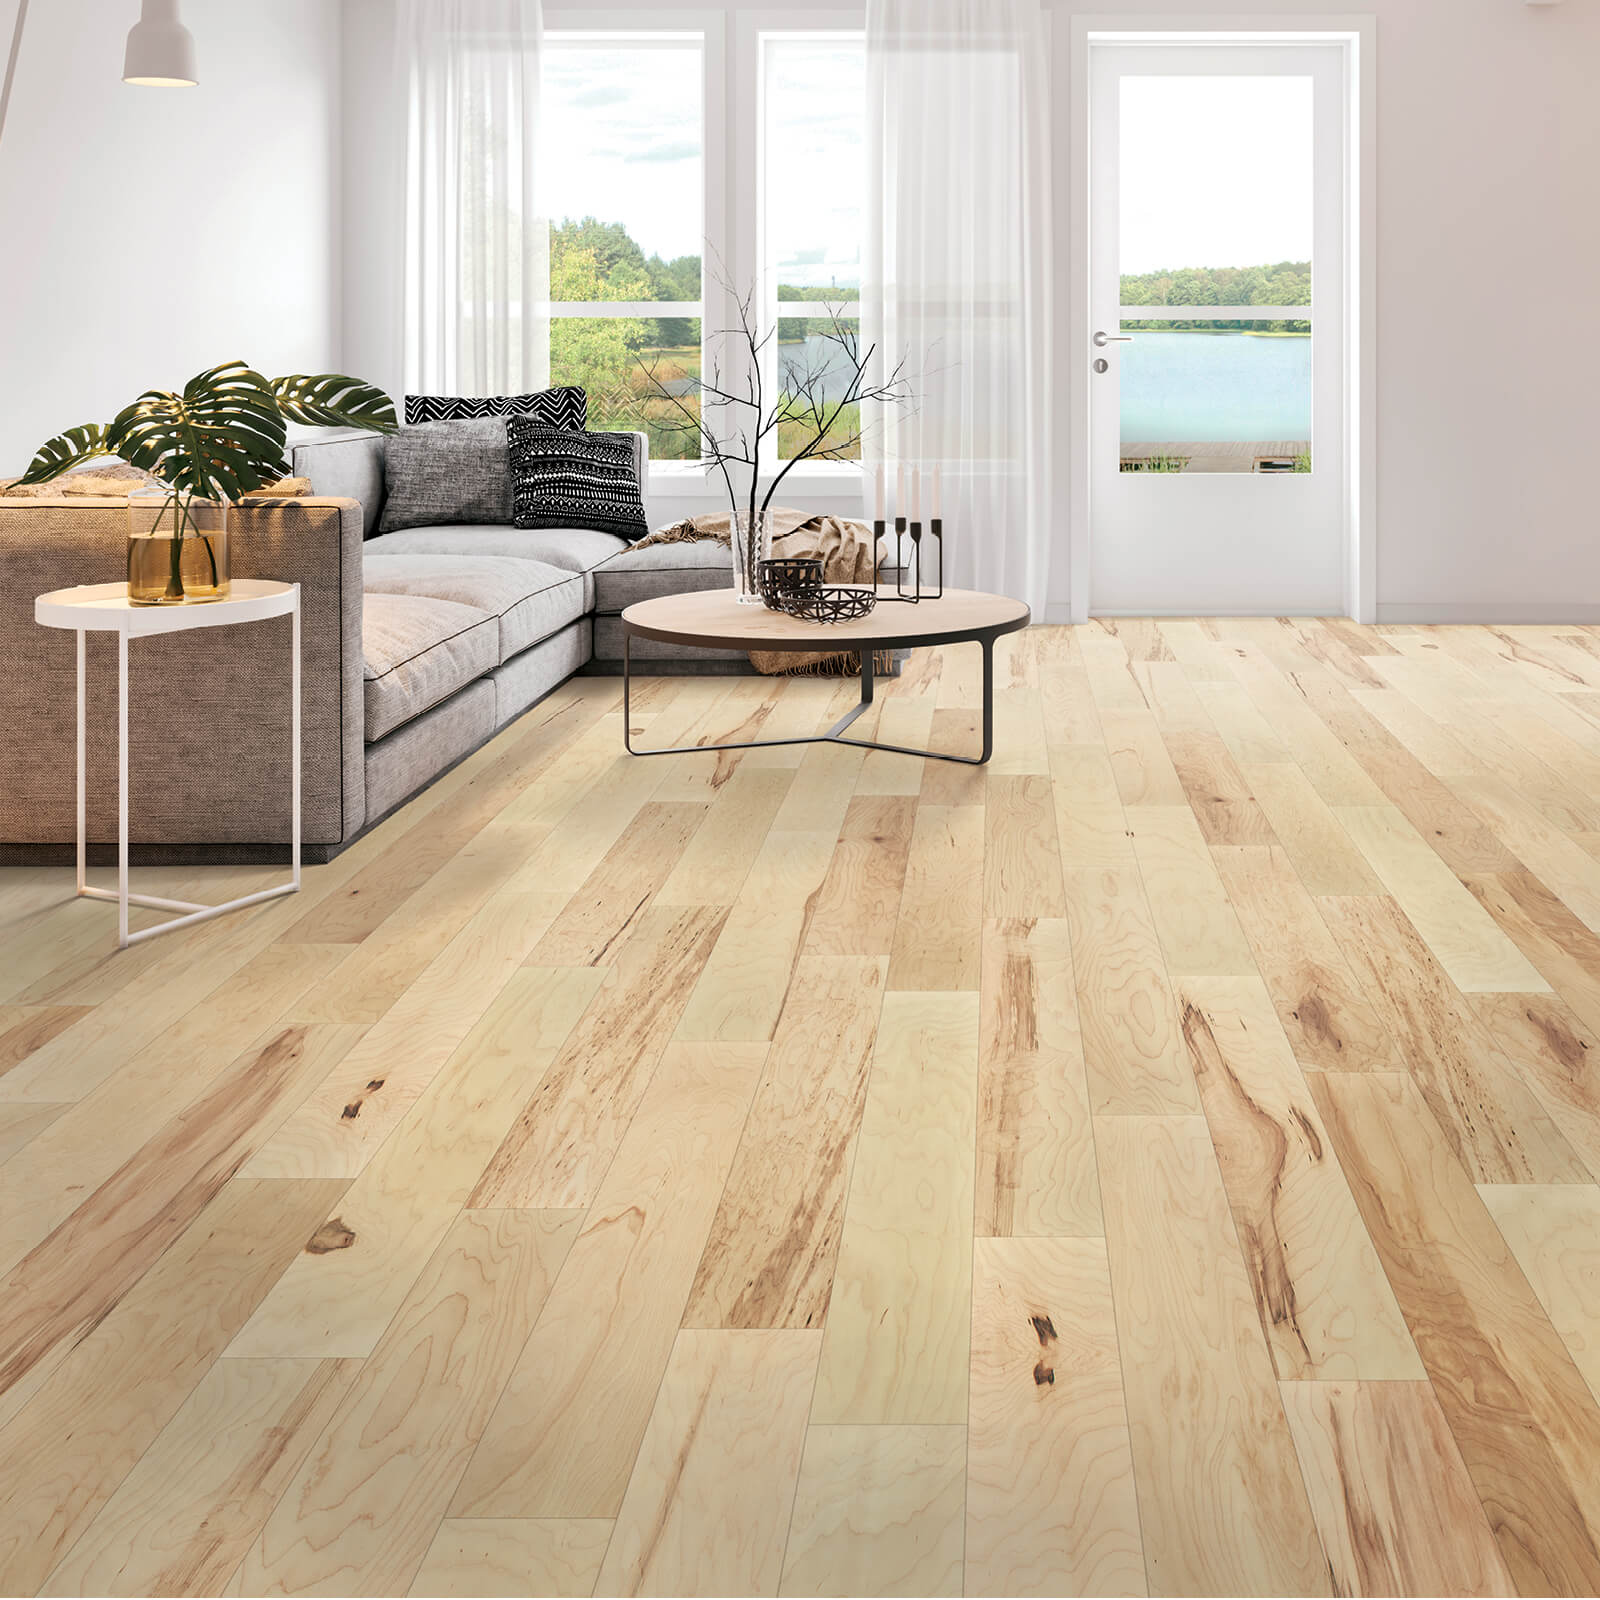 Highlands Ranch flooring | Dolphin Carpet & Tile